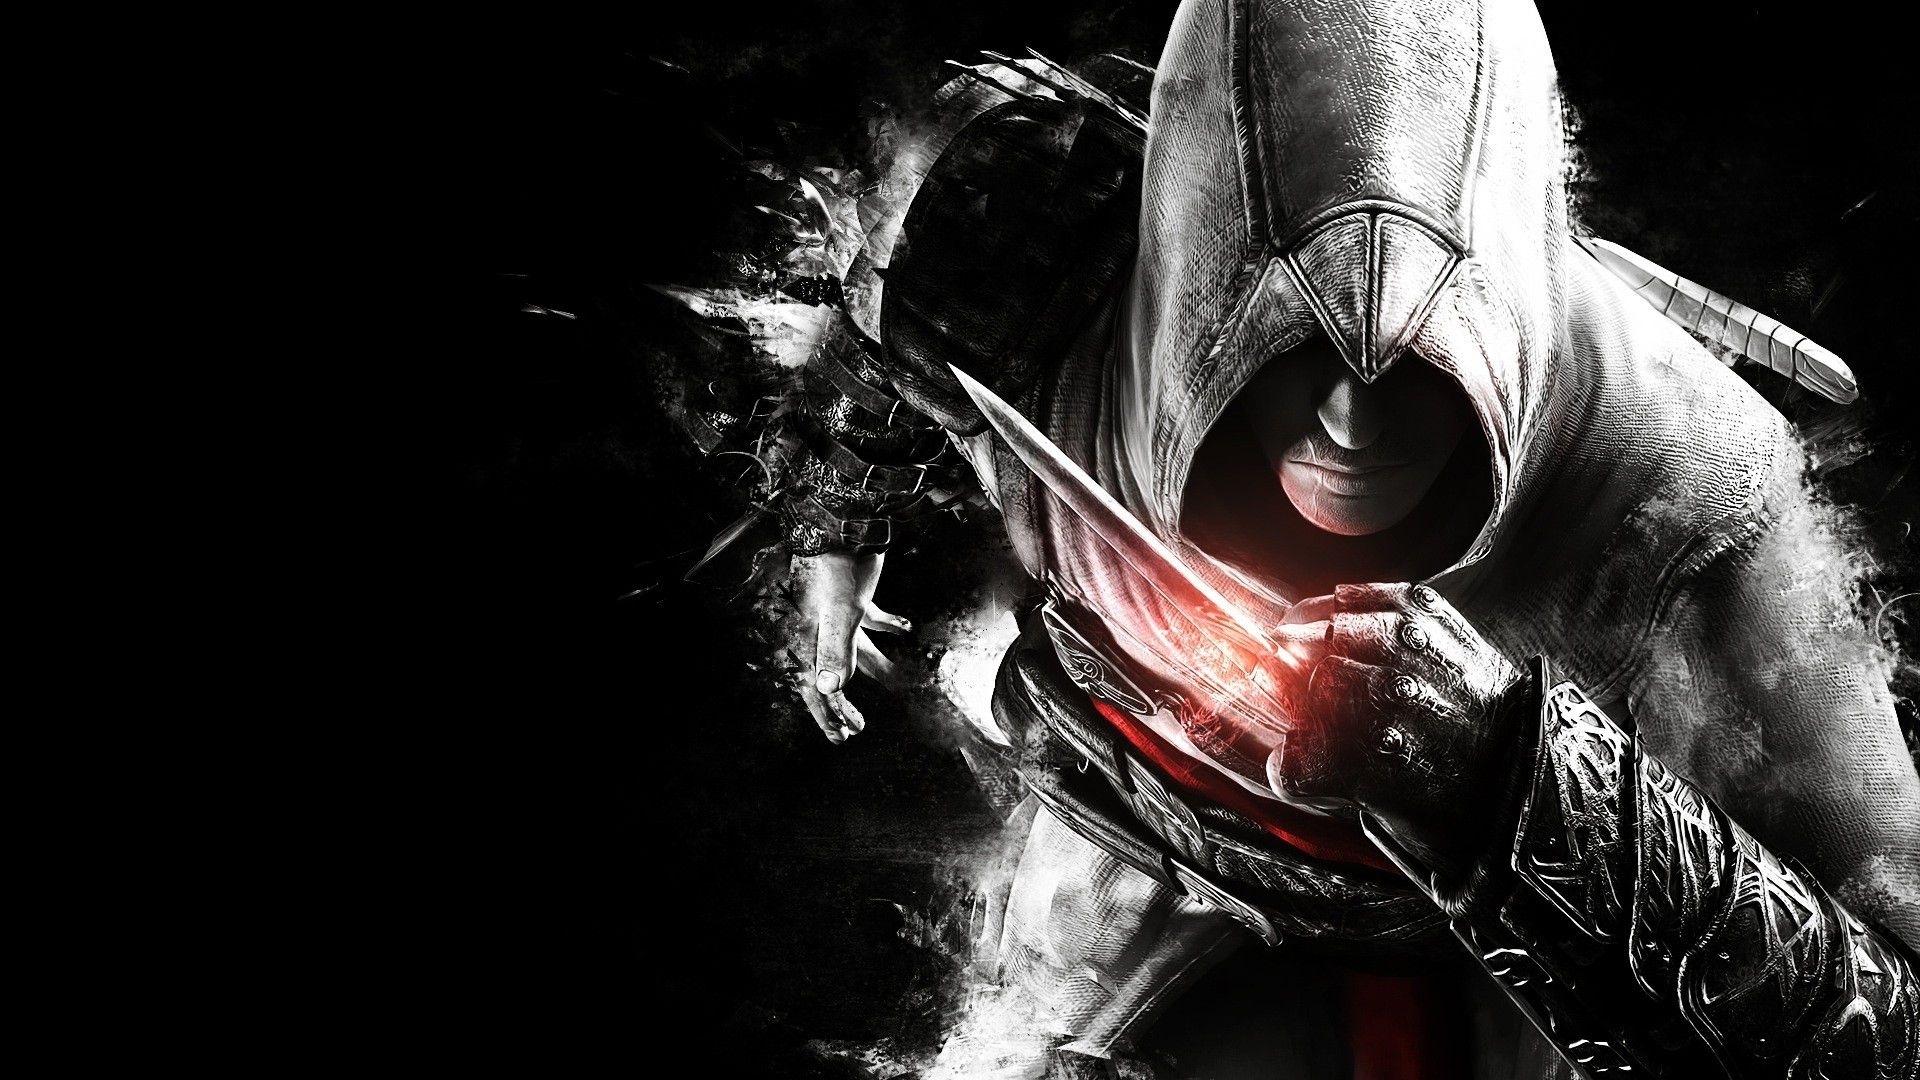 cool assassin's creed 4 wallpaper hd - http://imashon/w/cool